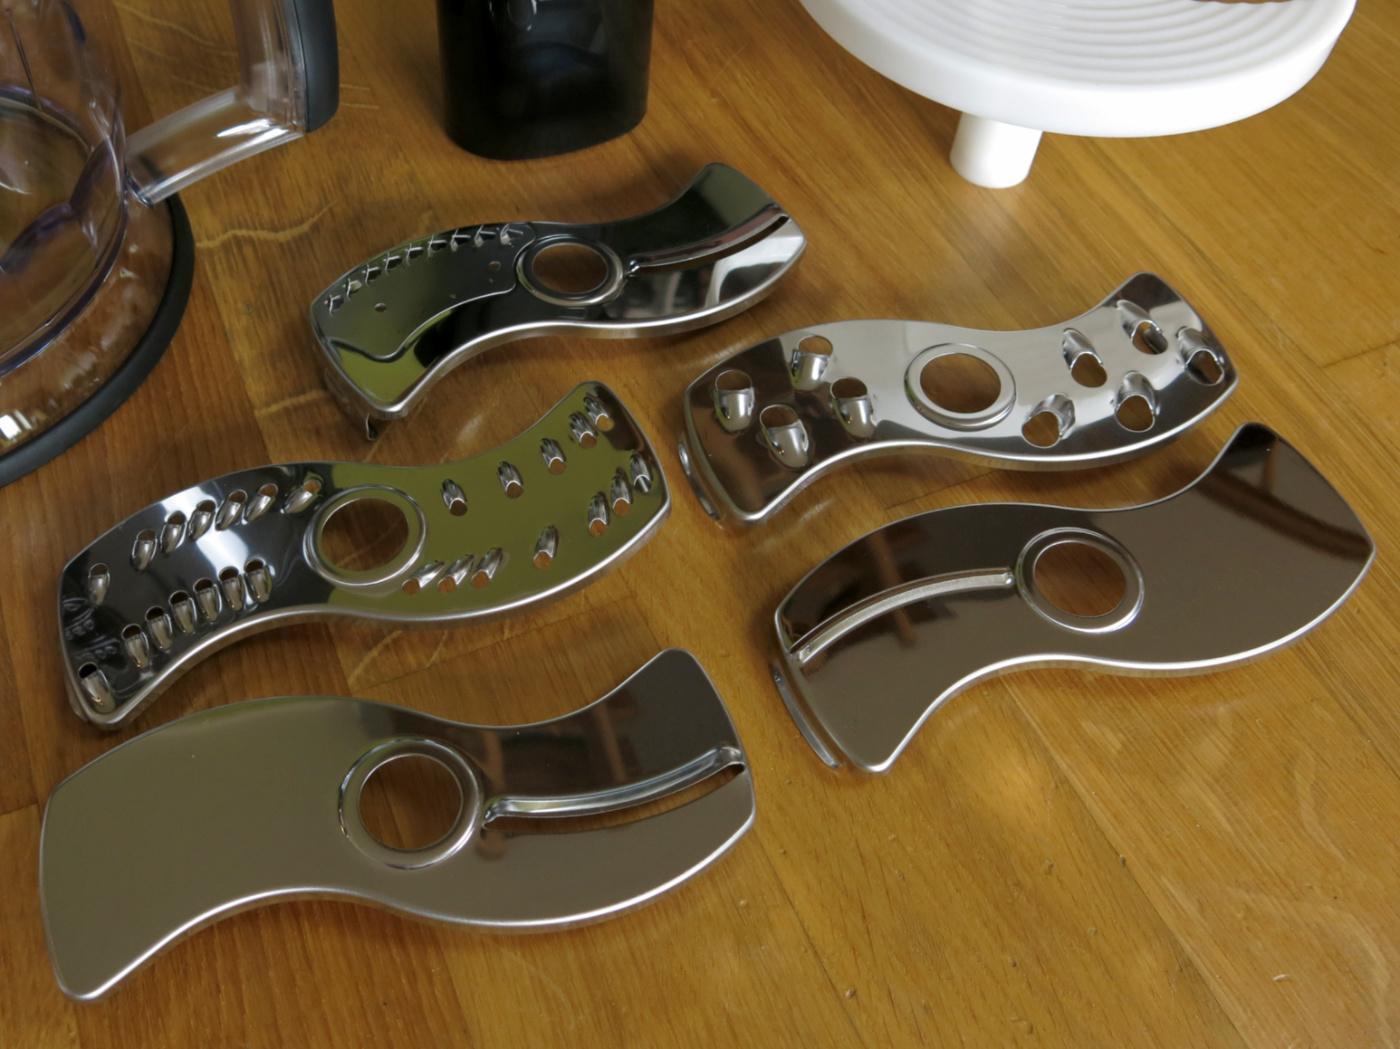 Braun MultiQuick 9 malakser